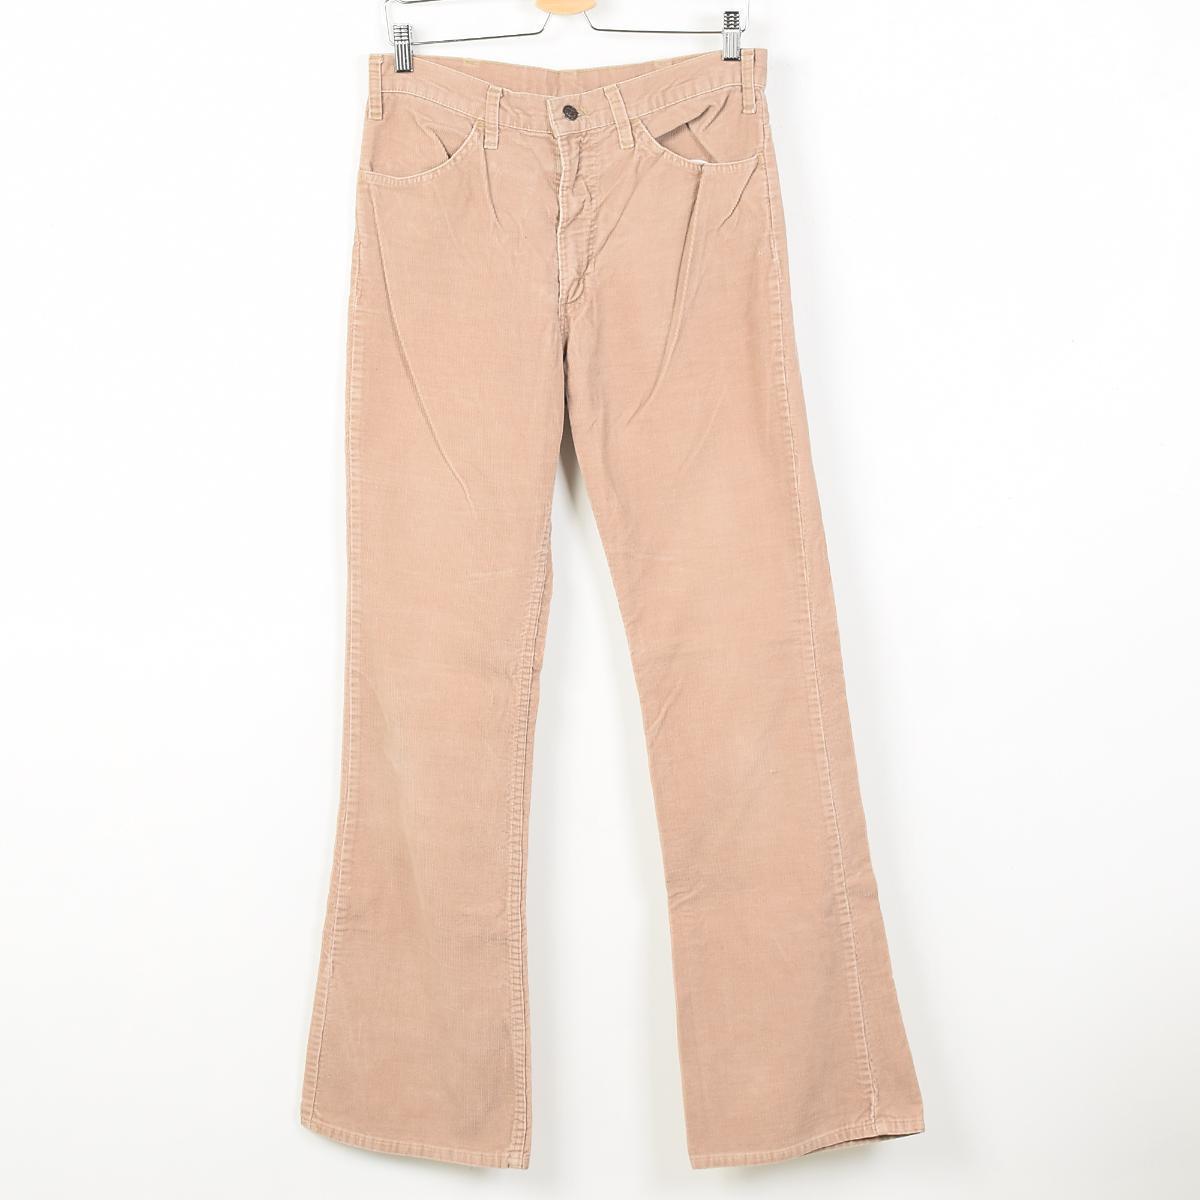 VINTAGE CLOTHING JAM TRADING | Rakuten Global Market: Levi's ...